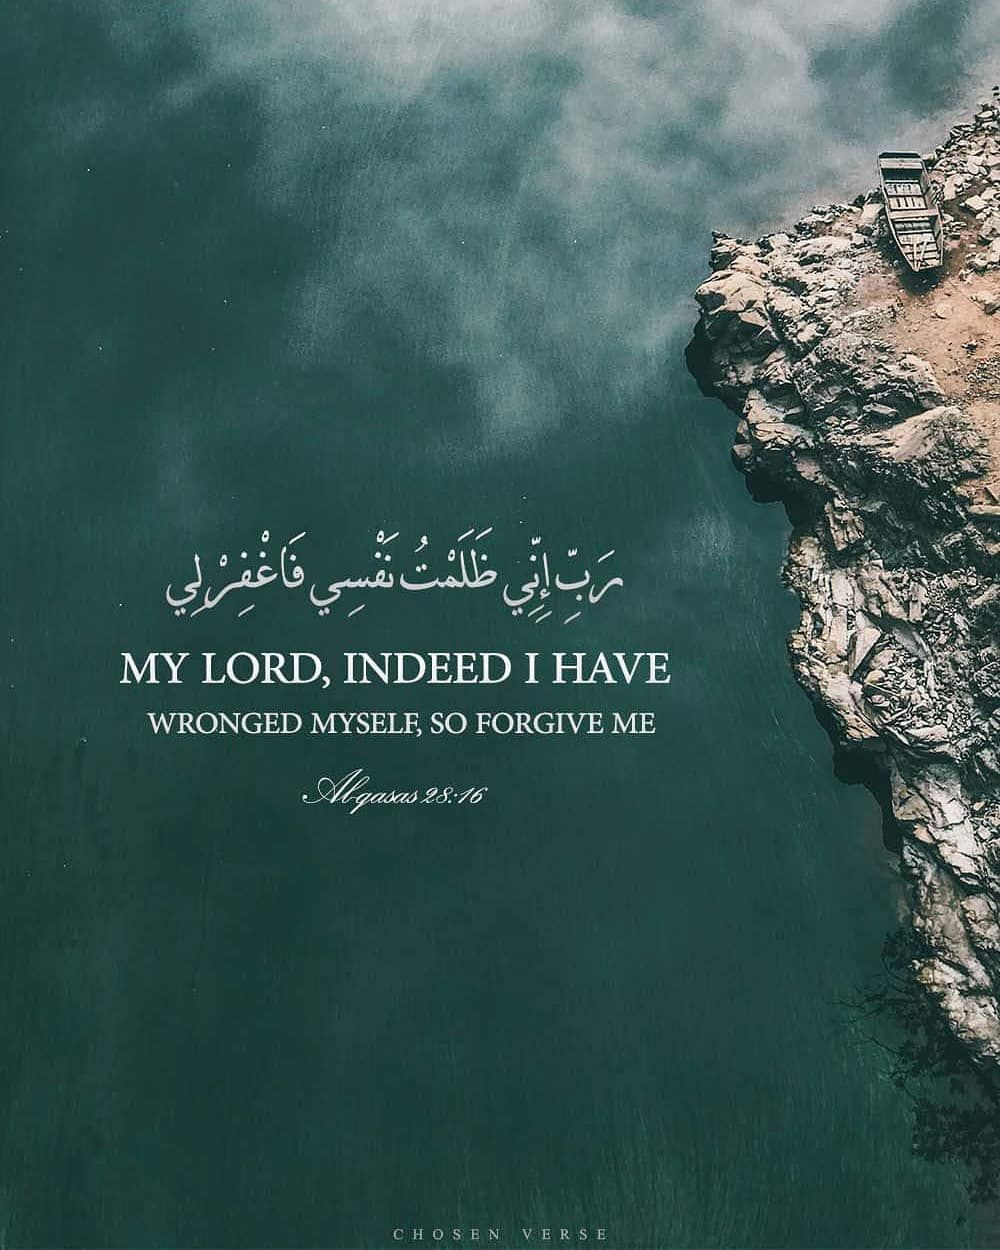 Chosen Verse On Instagram Amen Dua Quran Verses Dawah قران اسلام دعوة تذكير Quran Quotes Quran Quotes Verses Quran Quotes Love